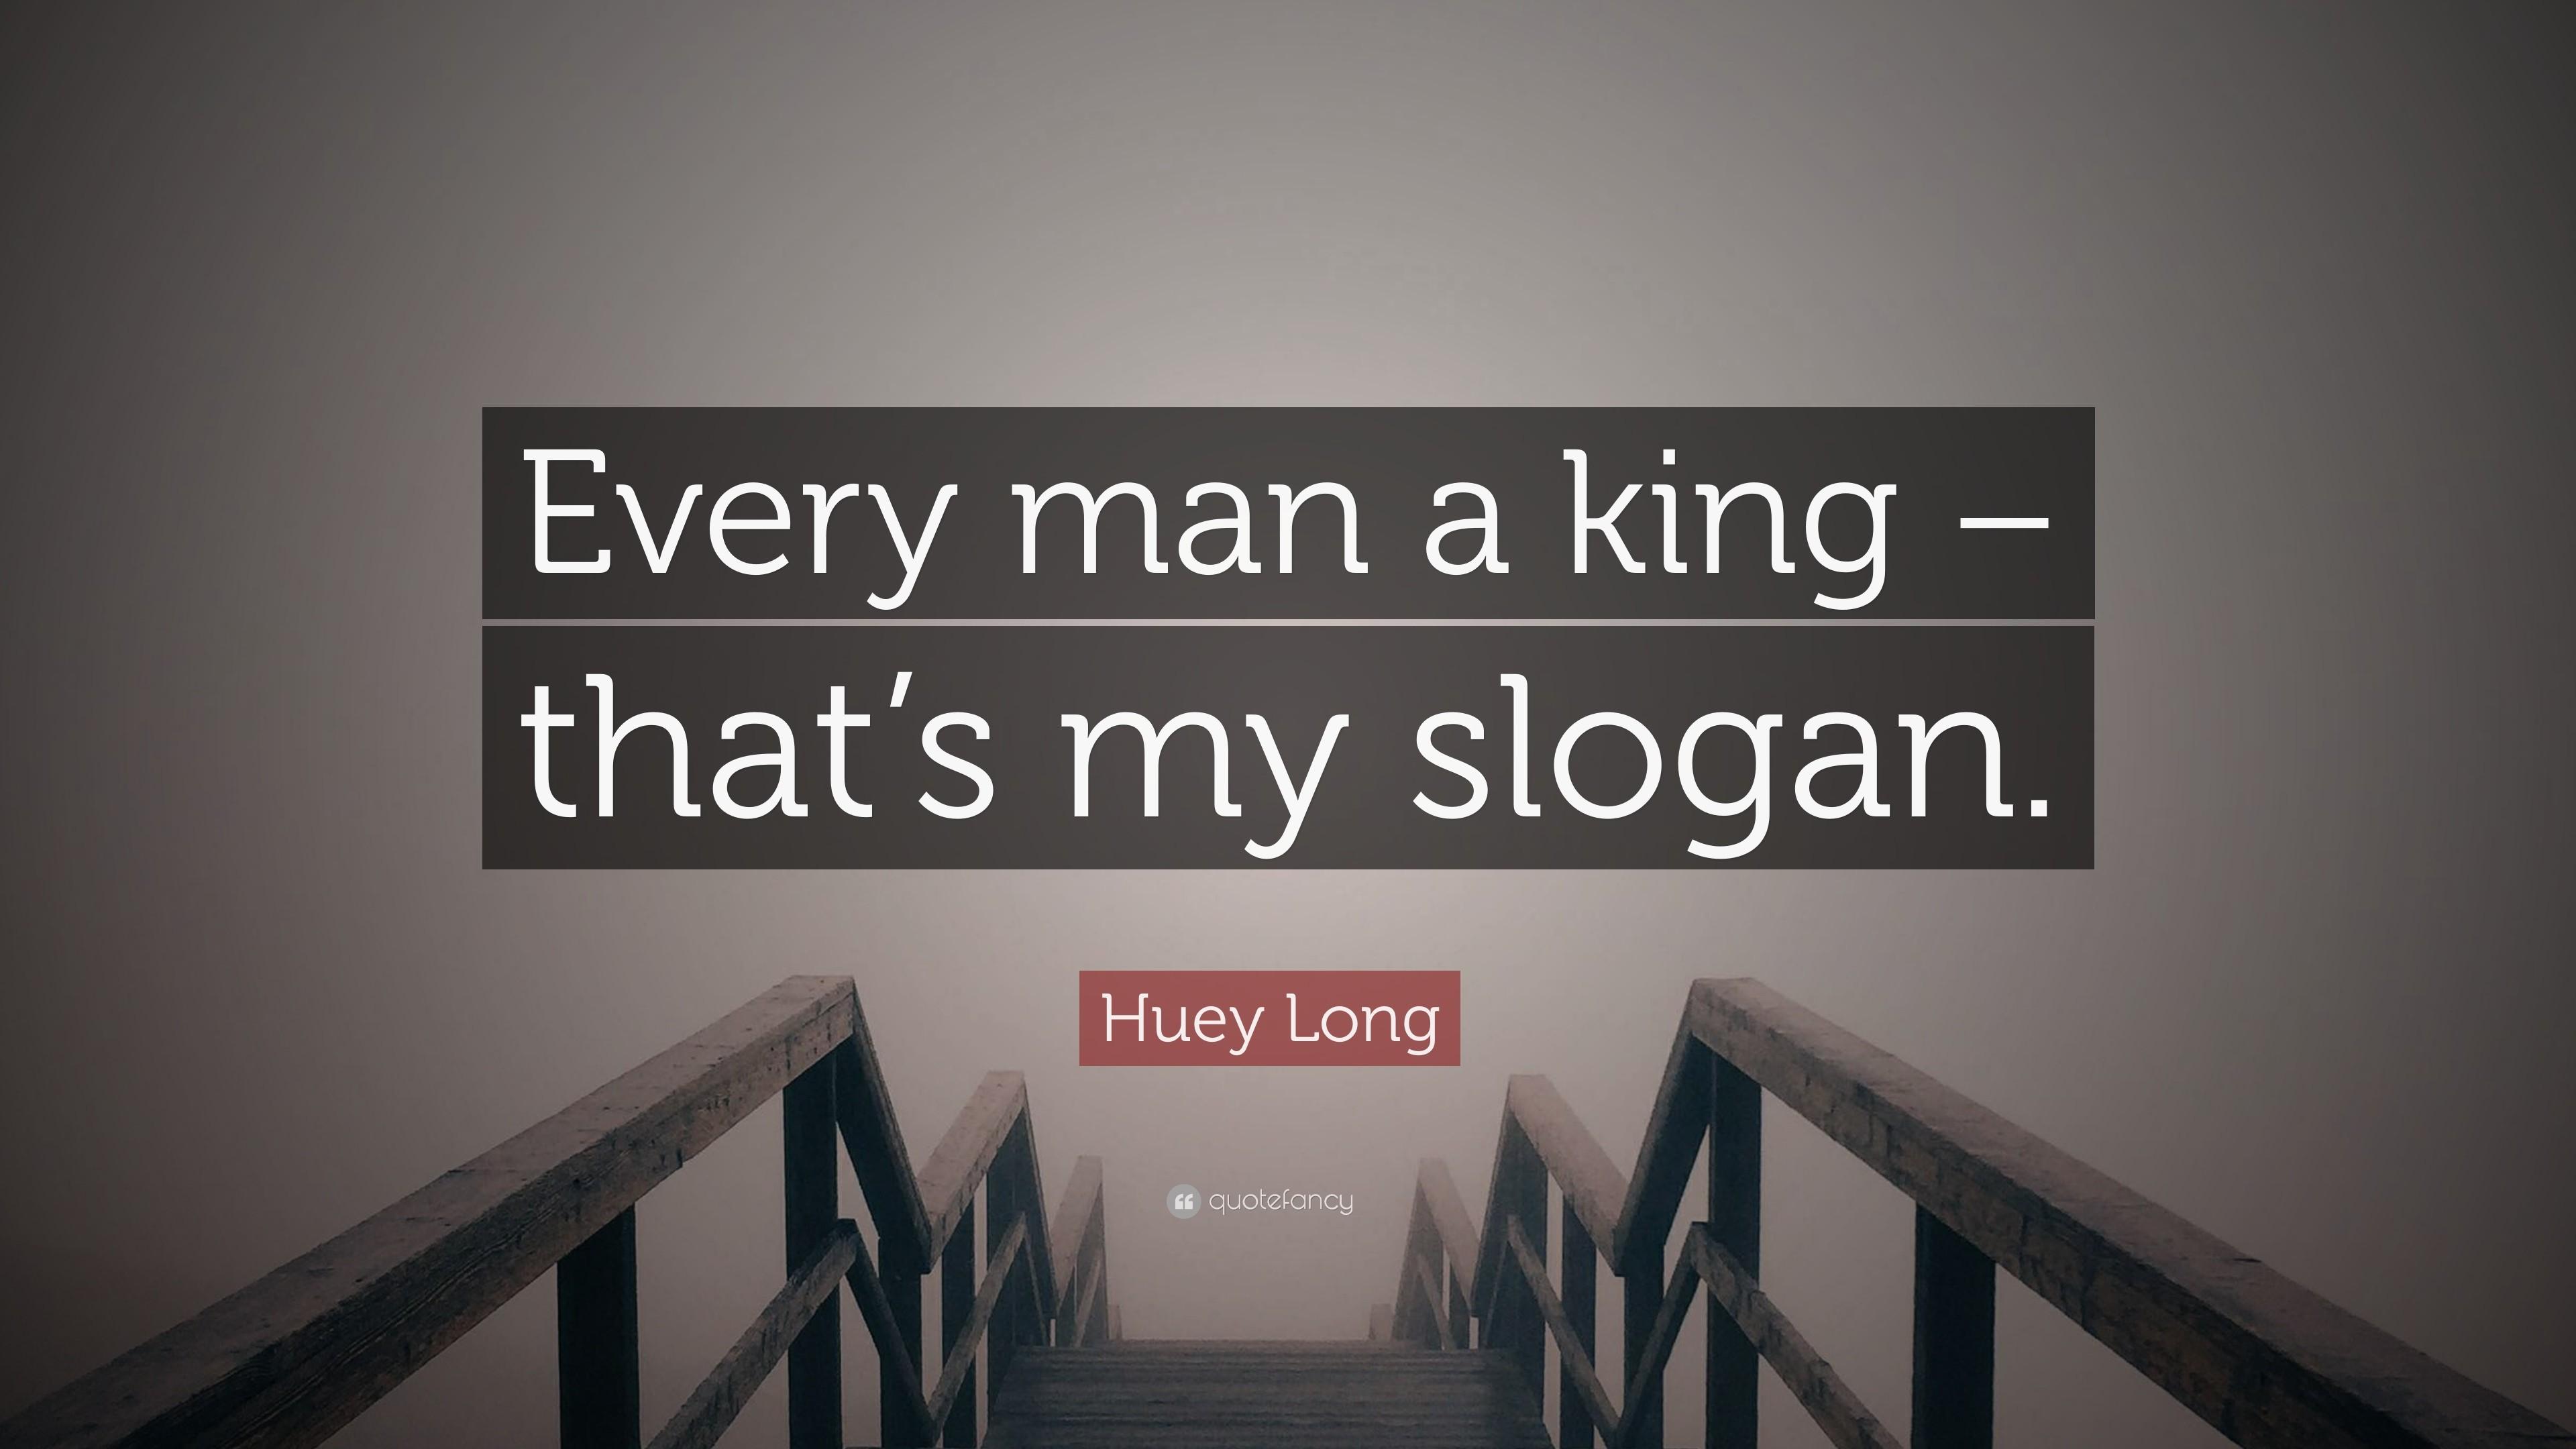 Res: 3840x2160, Huey Long E Every Man A King That S My Slogan 10